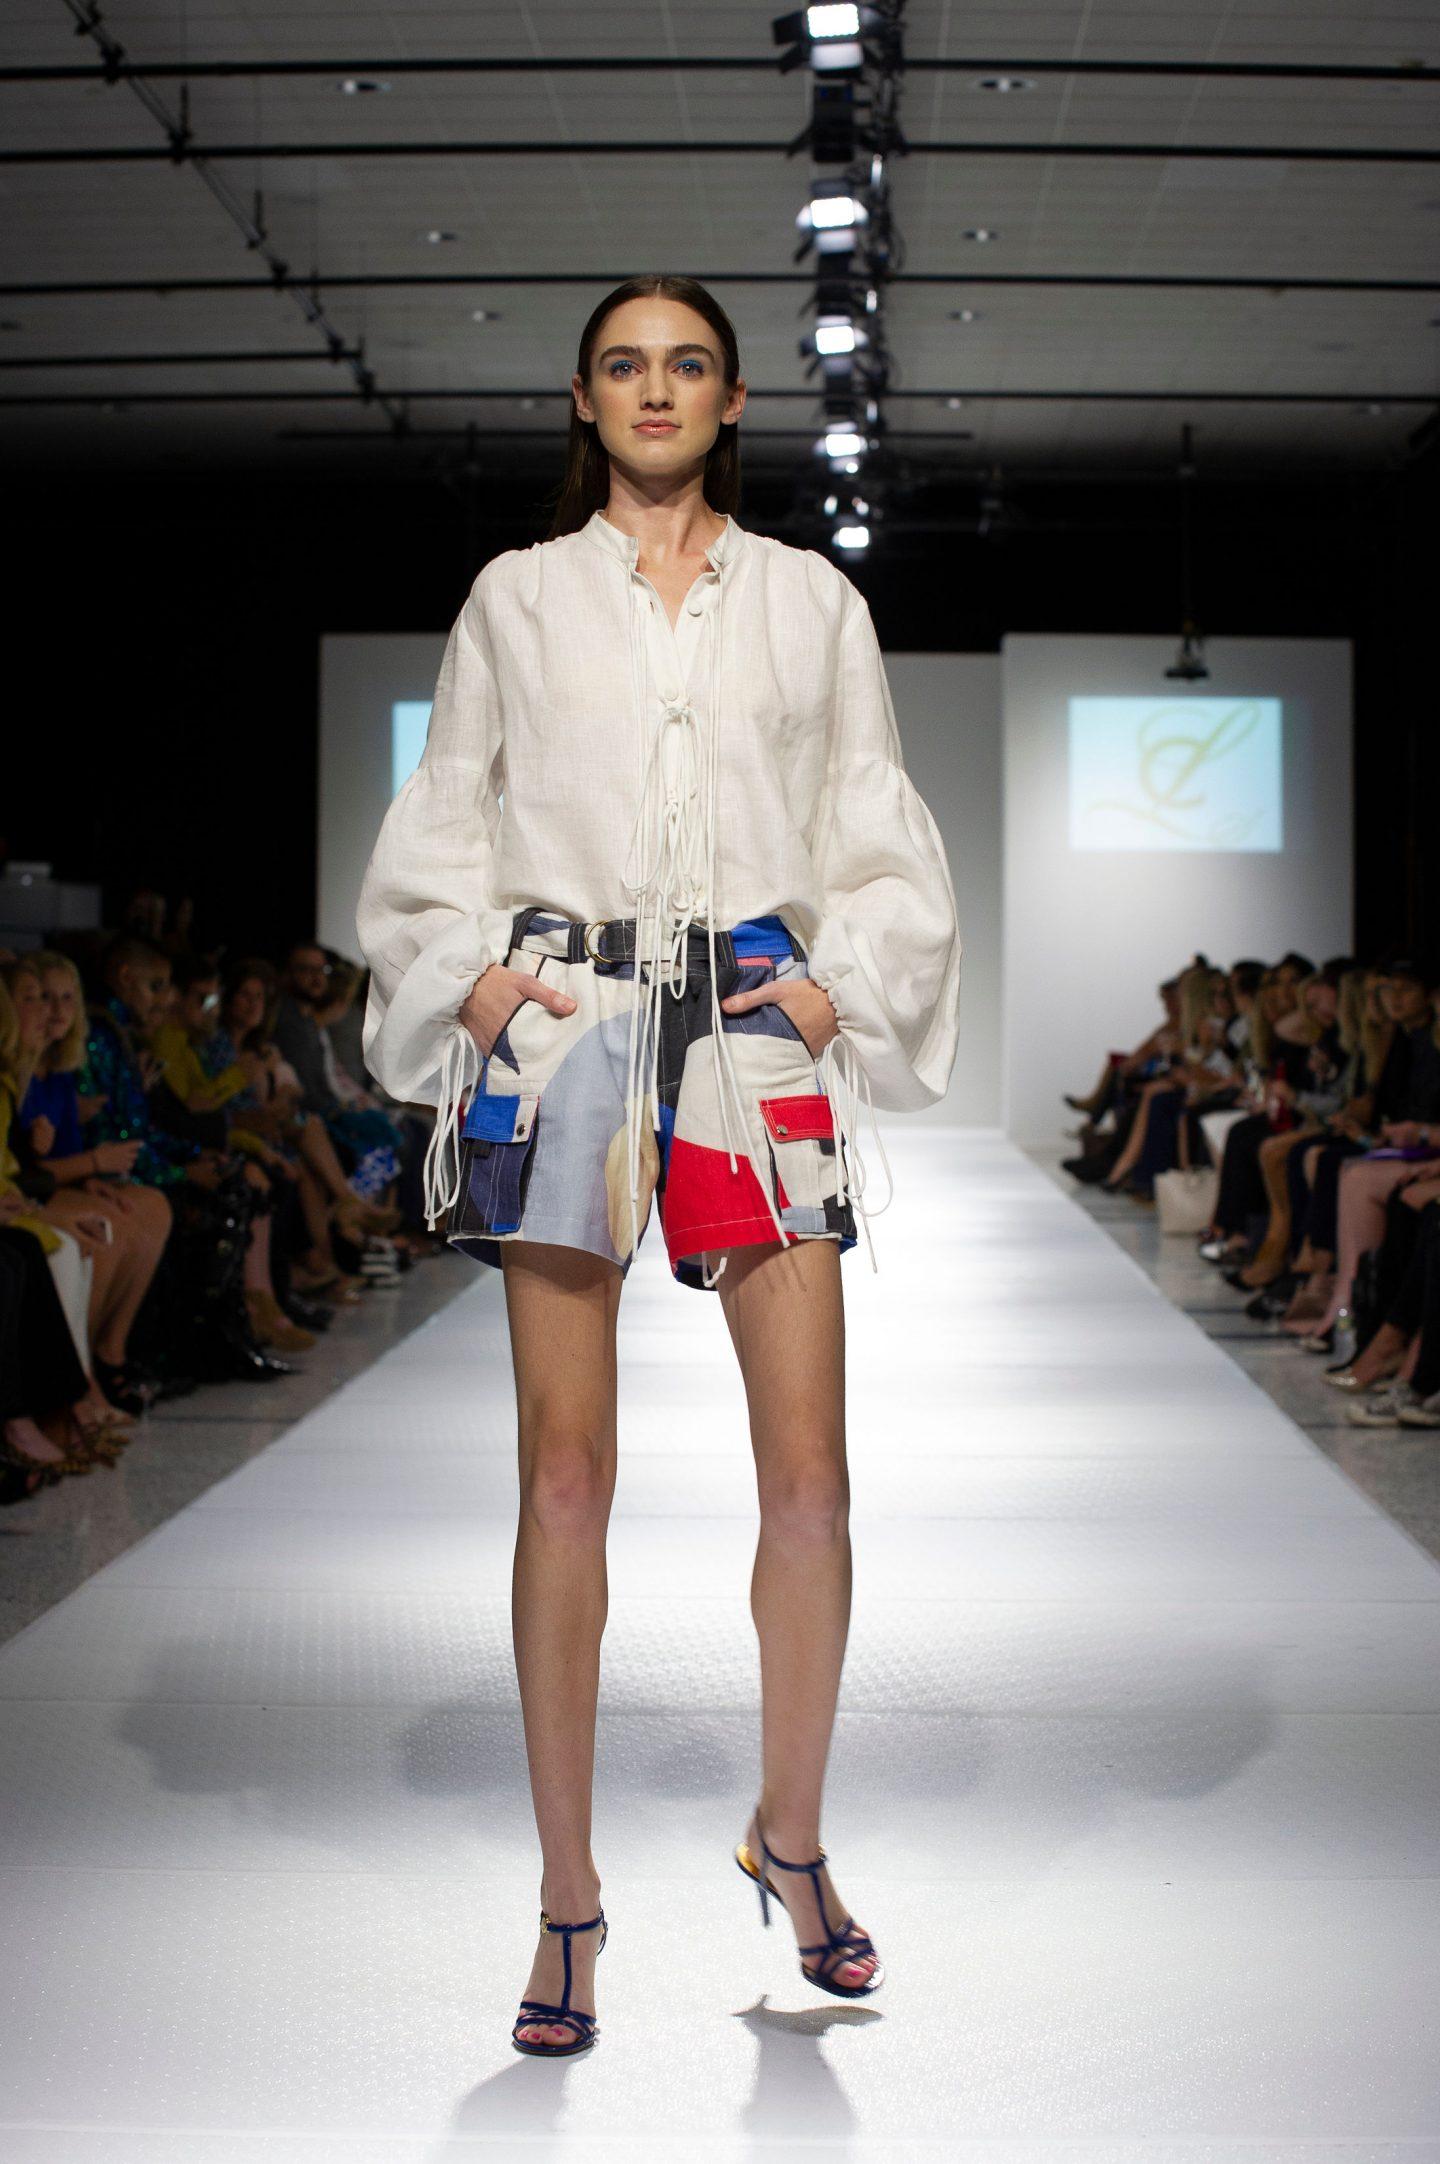 Designer Lavanya Coodly Closes STYLEWEEK New England